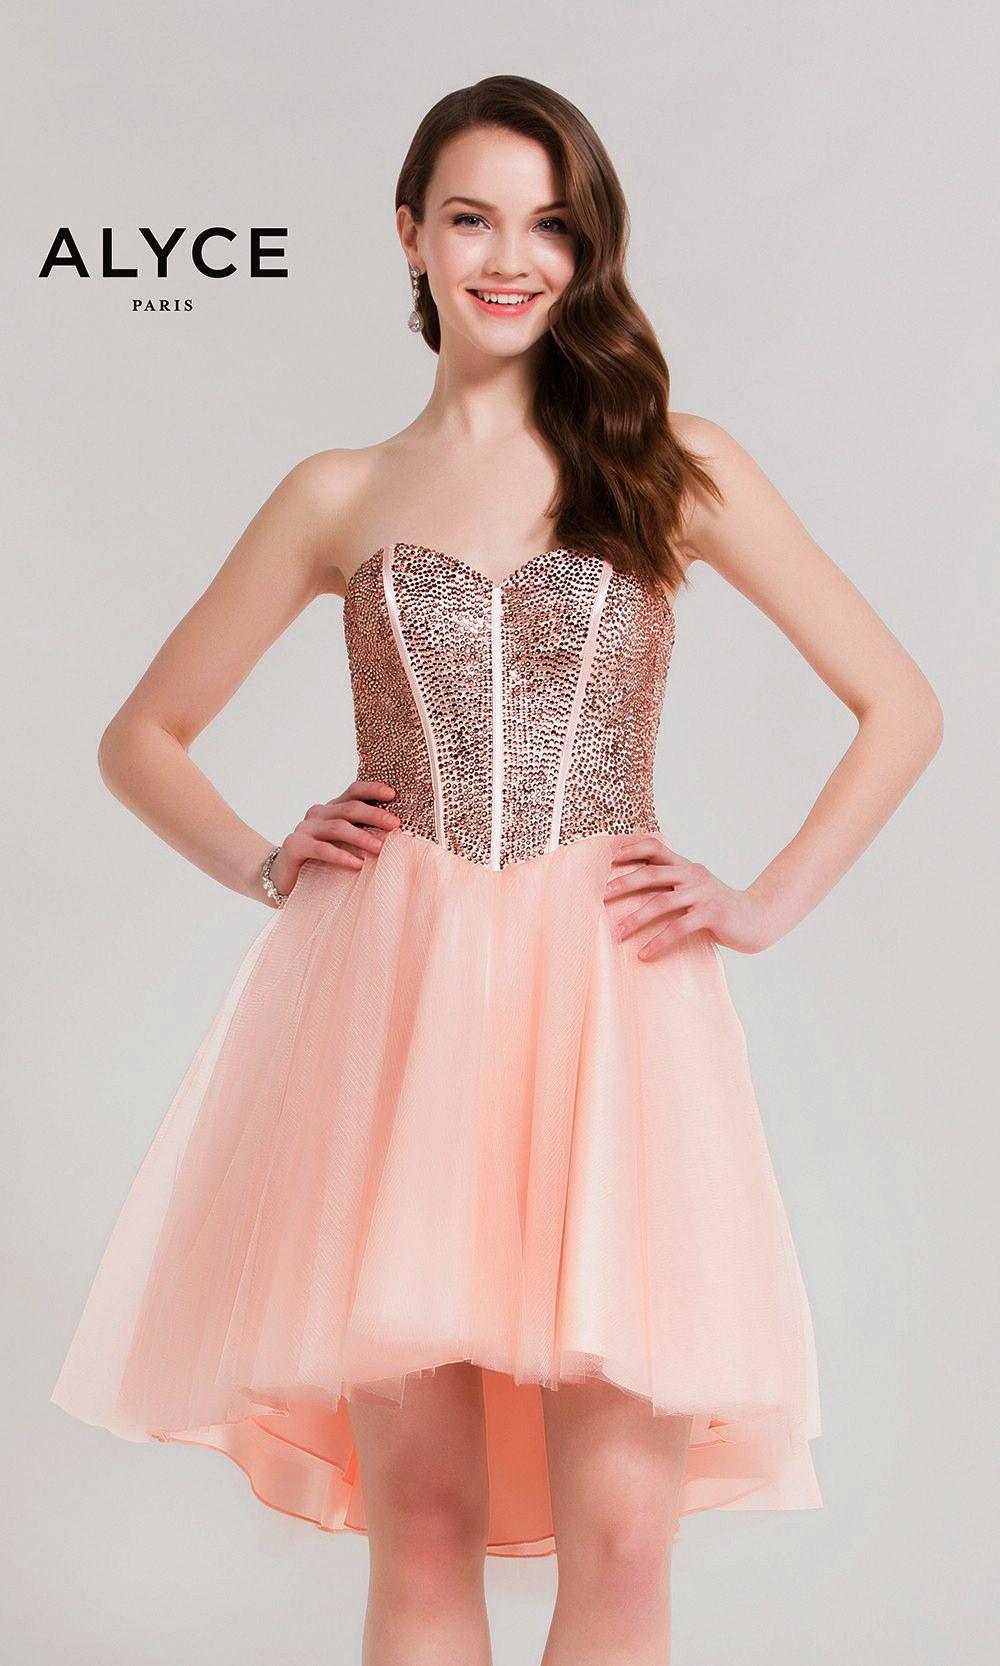 Short dresses by kalani hilliker for alyce parisucbrueaayucbr